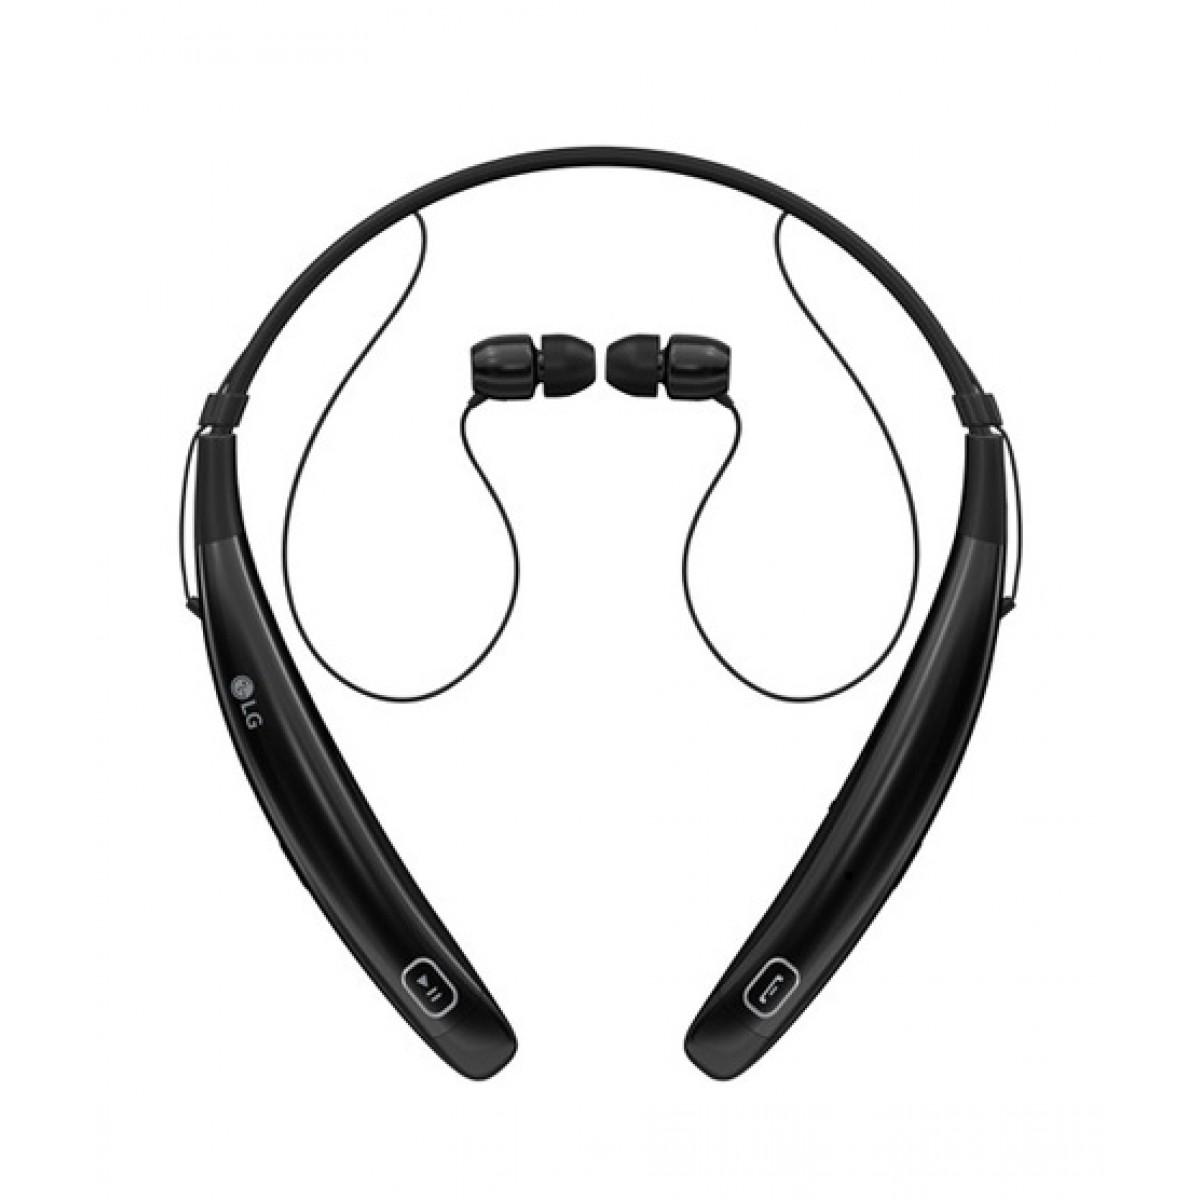 Lg Tone Pro Wireless Headset Price In Pakistan Buy Lg Tone Pro Stereo Headset Hbs 770 Ishopping Pk